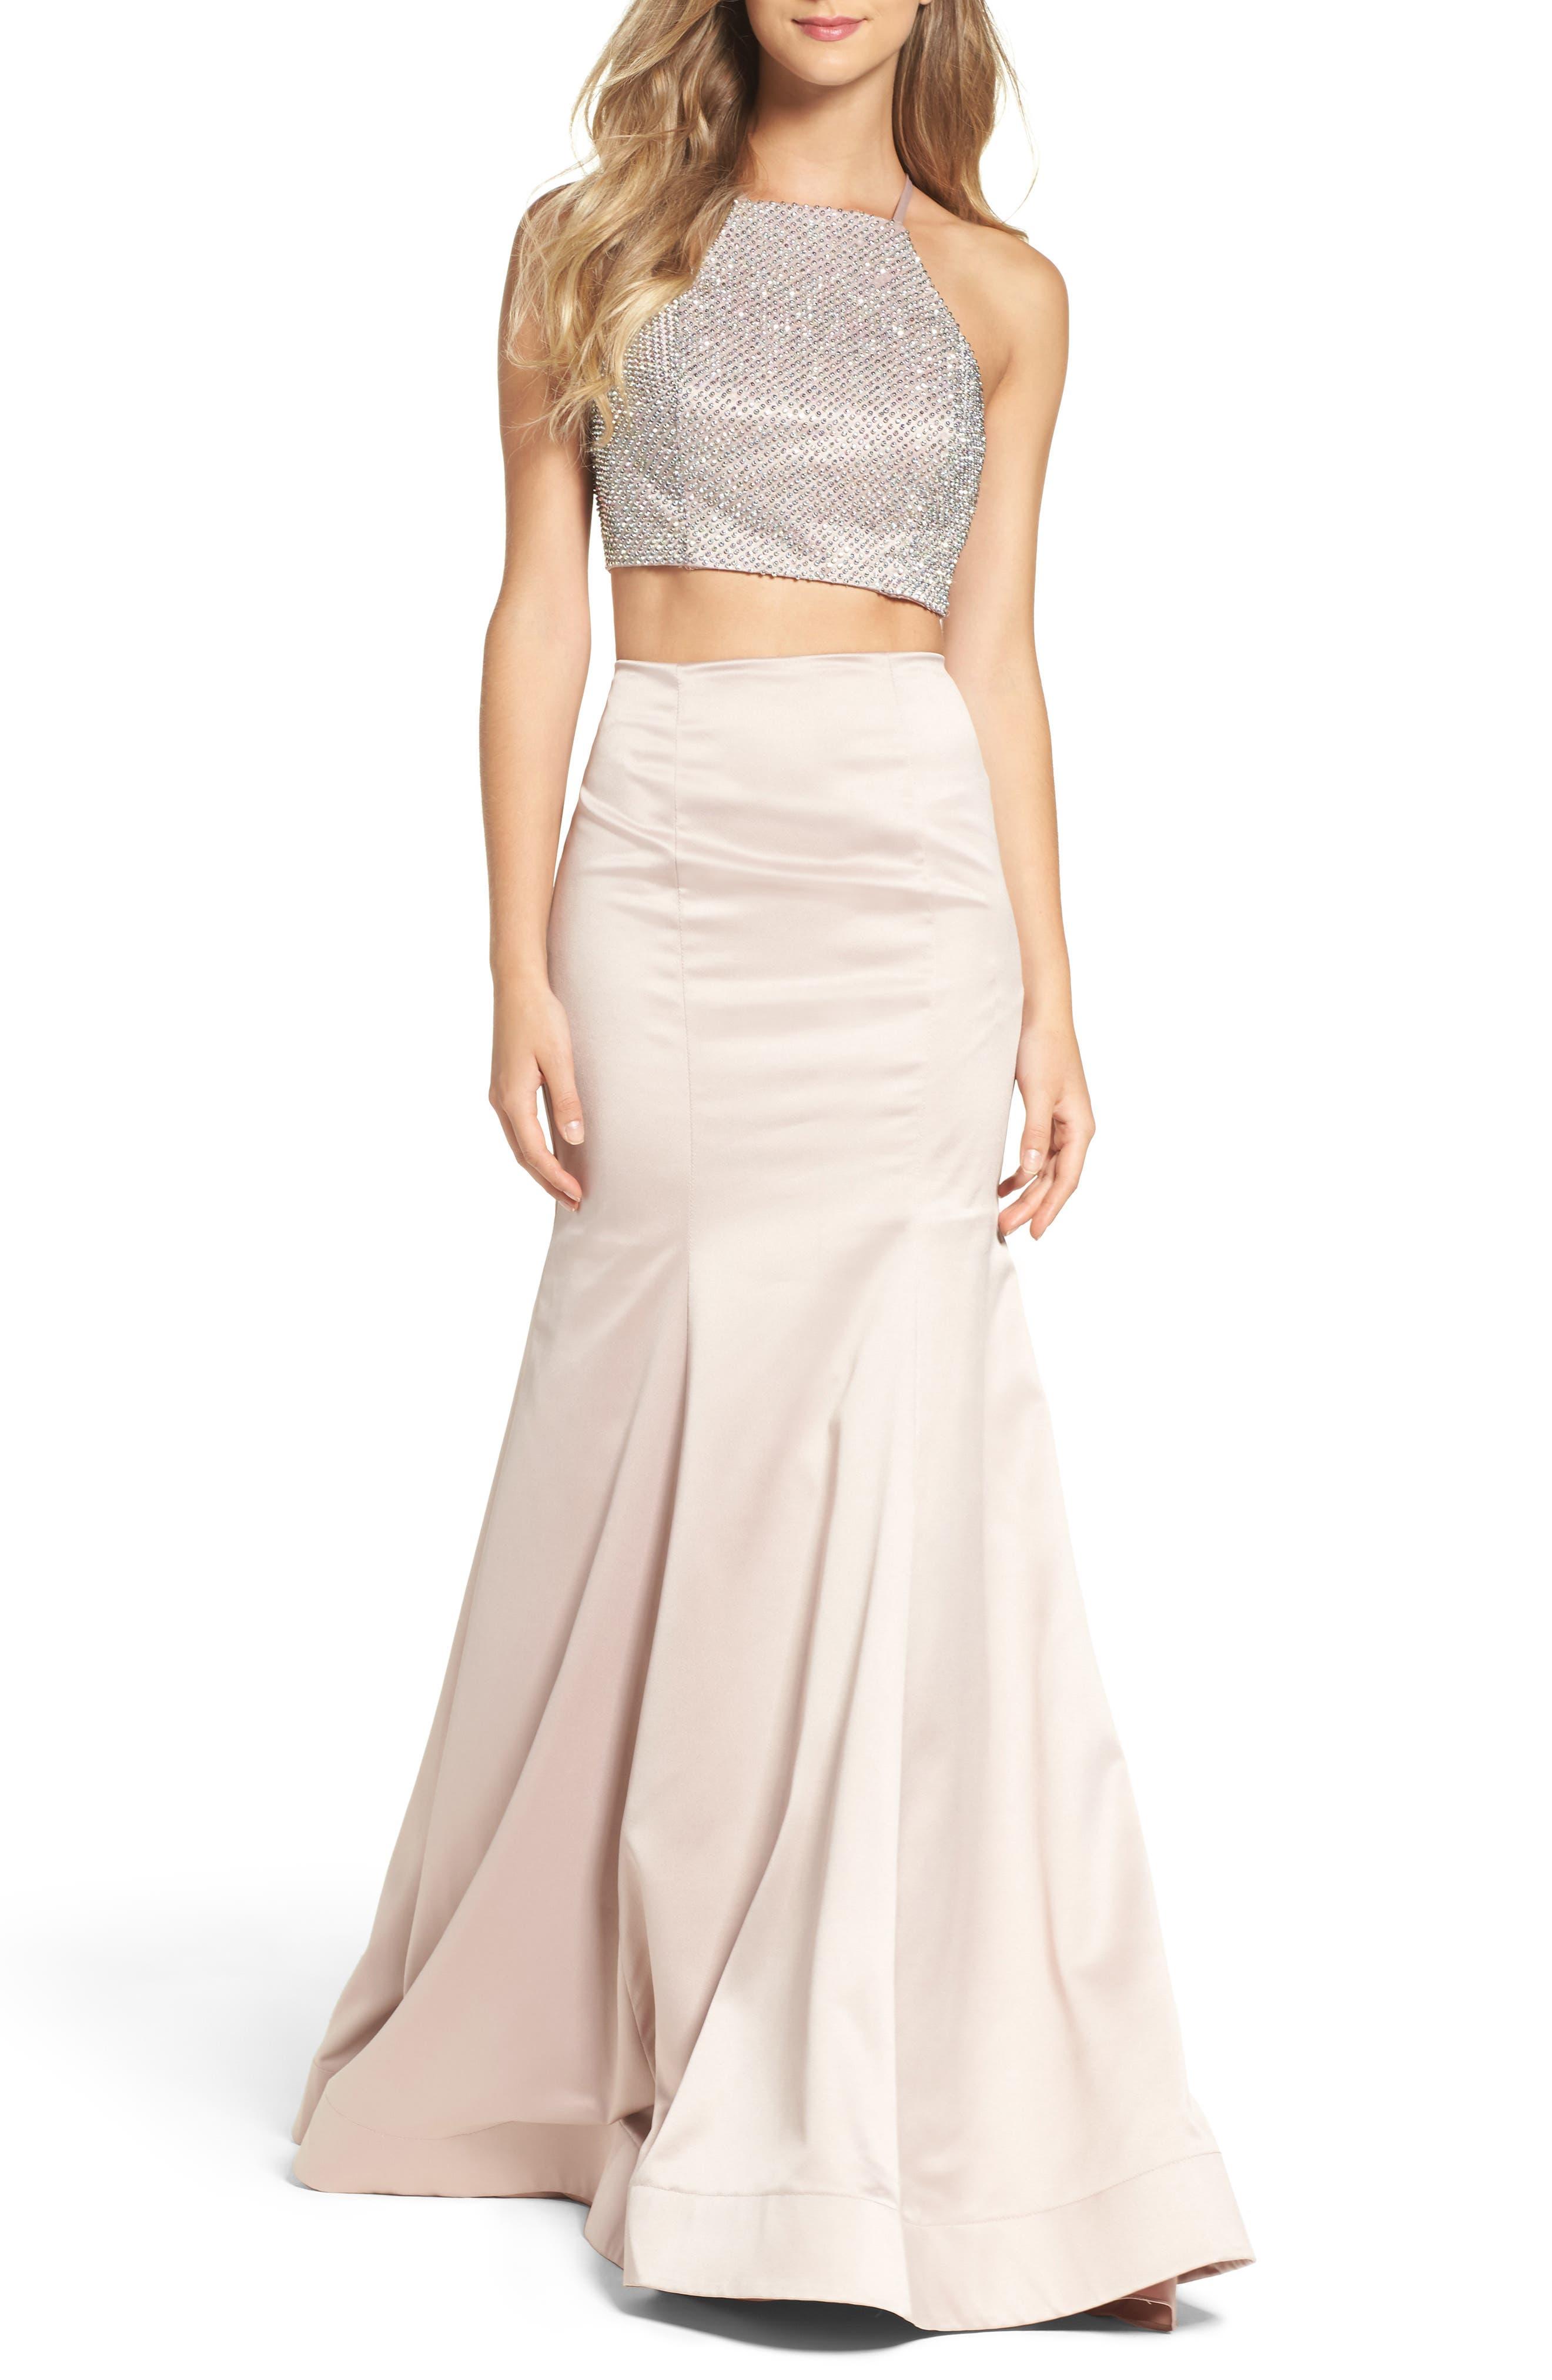 Alternate Image 1 Selected - La Femme Beaded Two-Piece Mermaid Gown